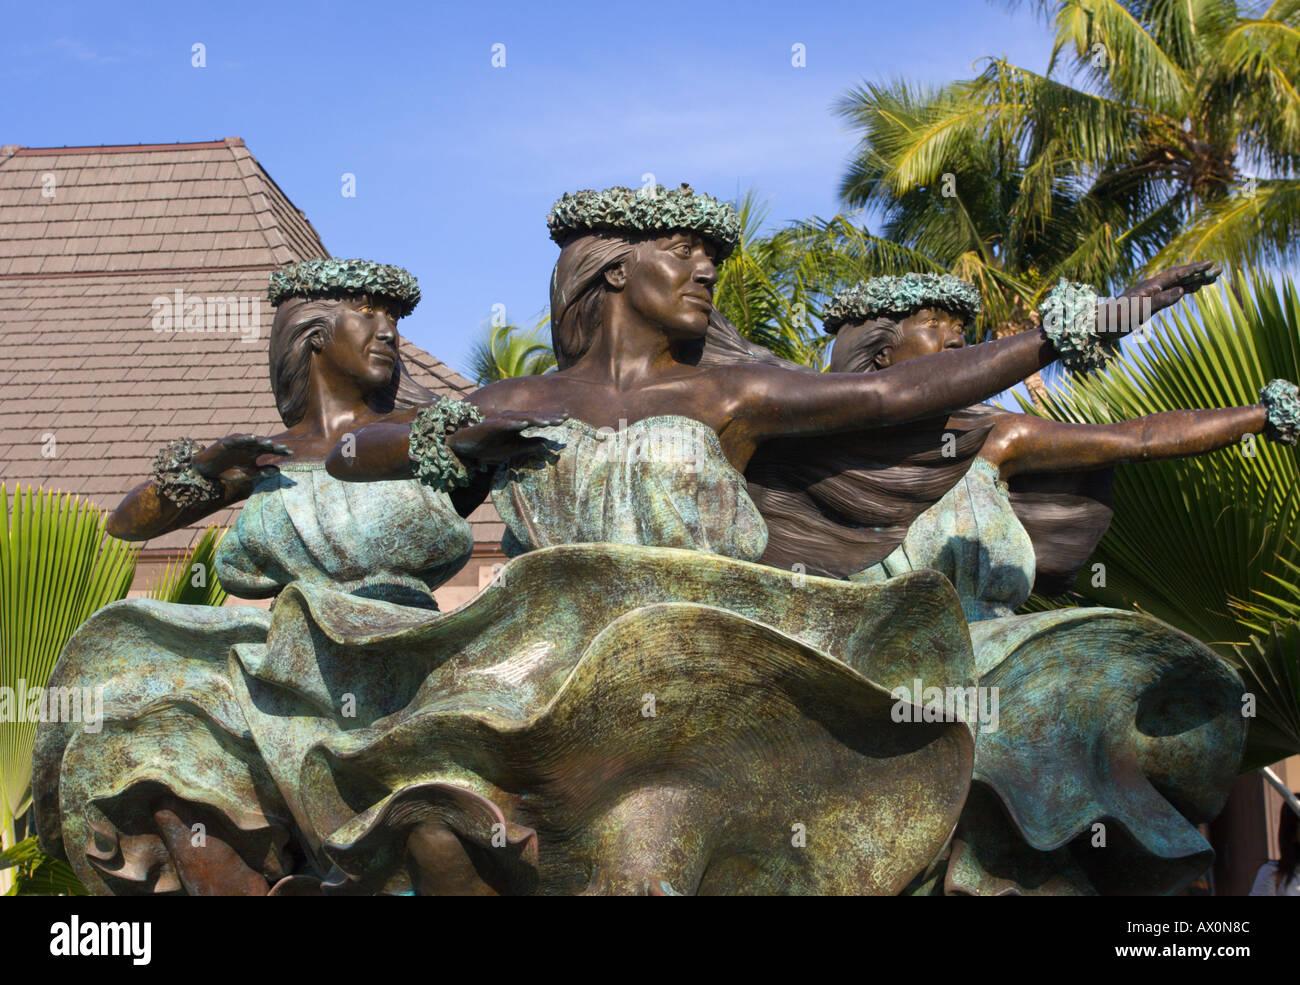 Lovely bronze statue of Hawaiian dancing trio at Keahole Kona International Airport Big Island Hawaii - Stock Image